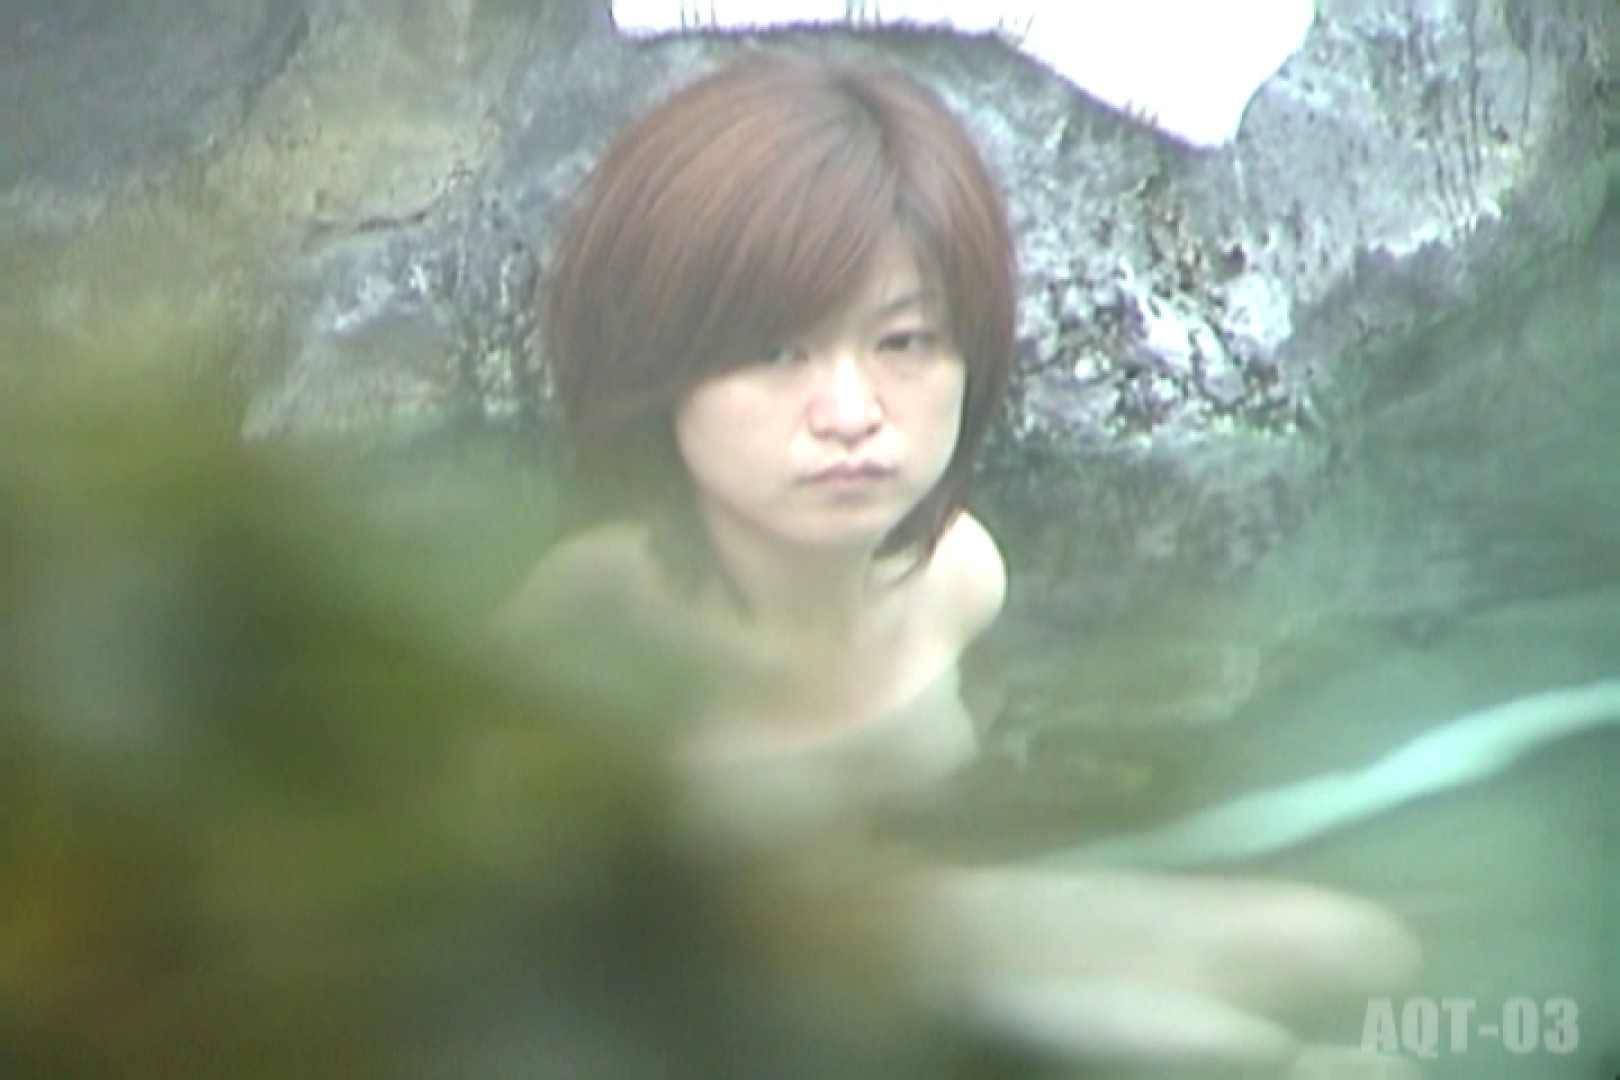 Aquaな露天風呂Vol.731 綺麗なOLたち ワレメ動画紹介 100枚 38